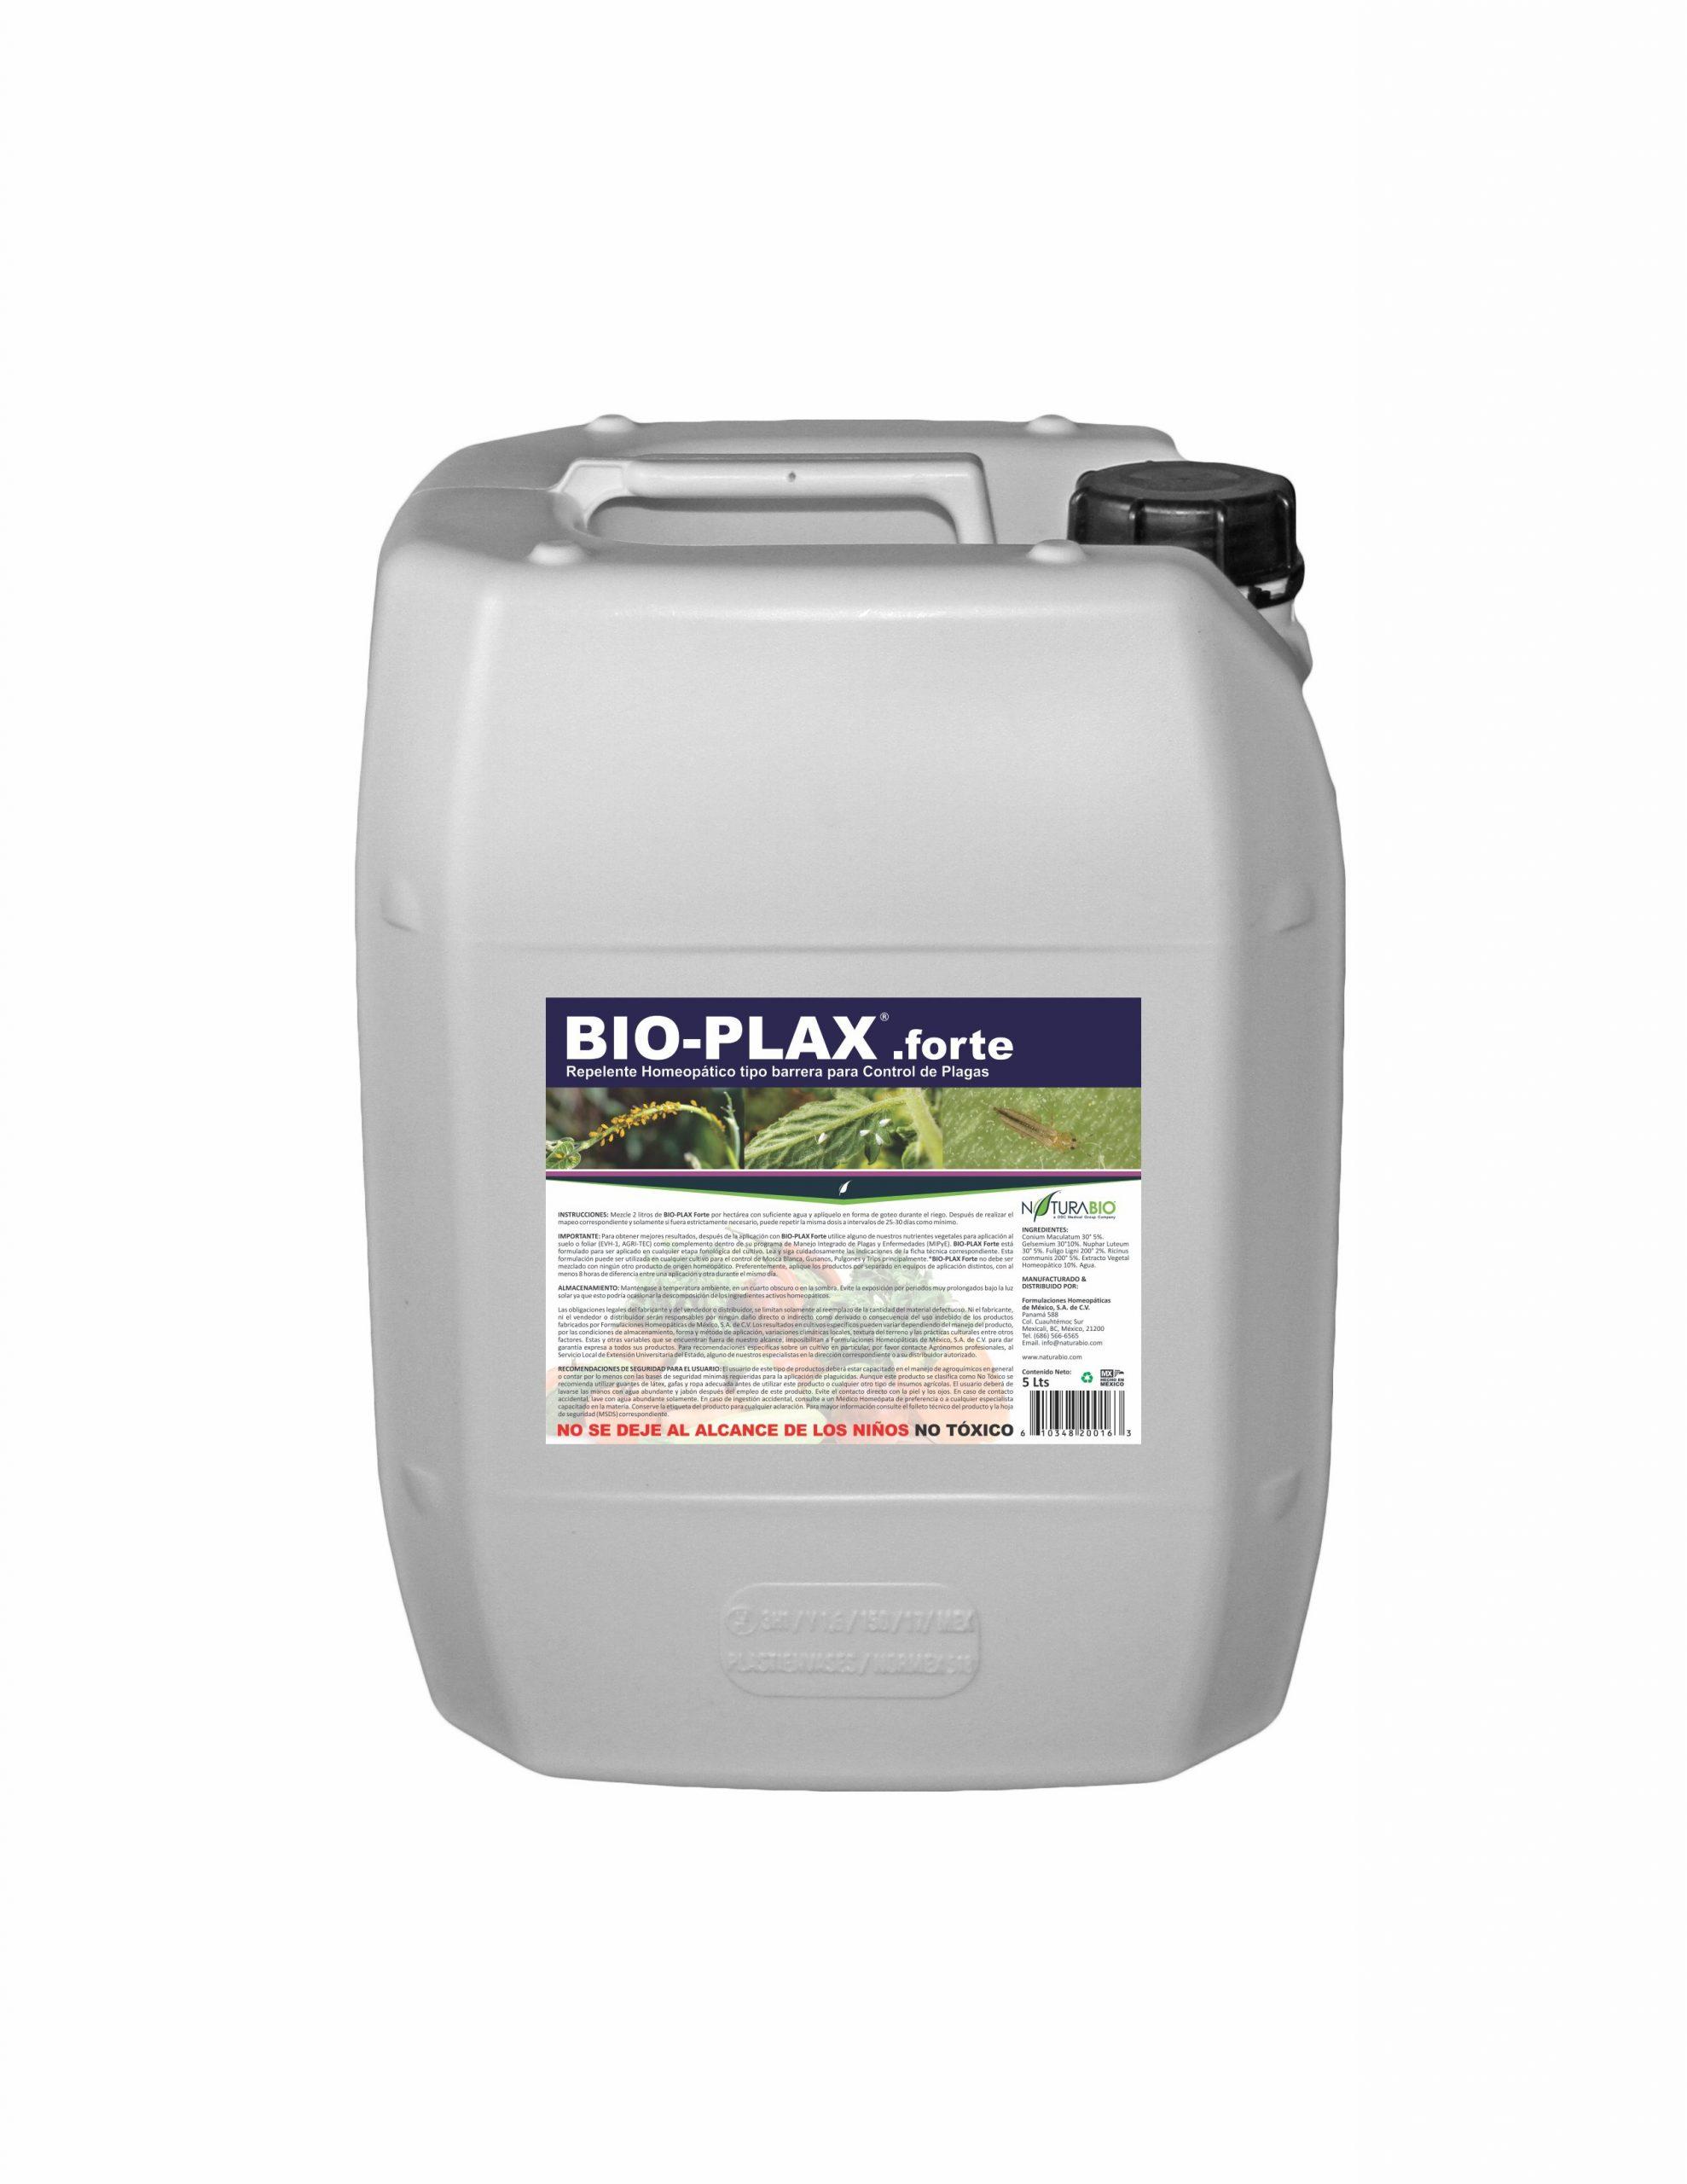 BIO-PLAX.forte Repelente Homeopático tipo barrera para Control de Plagas